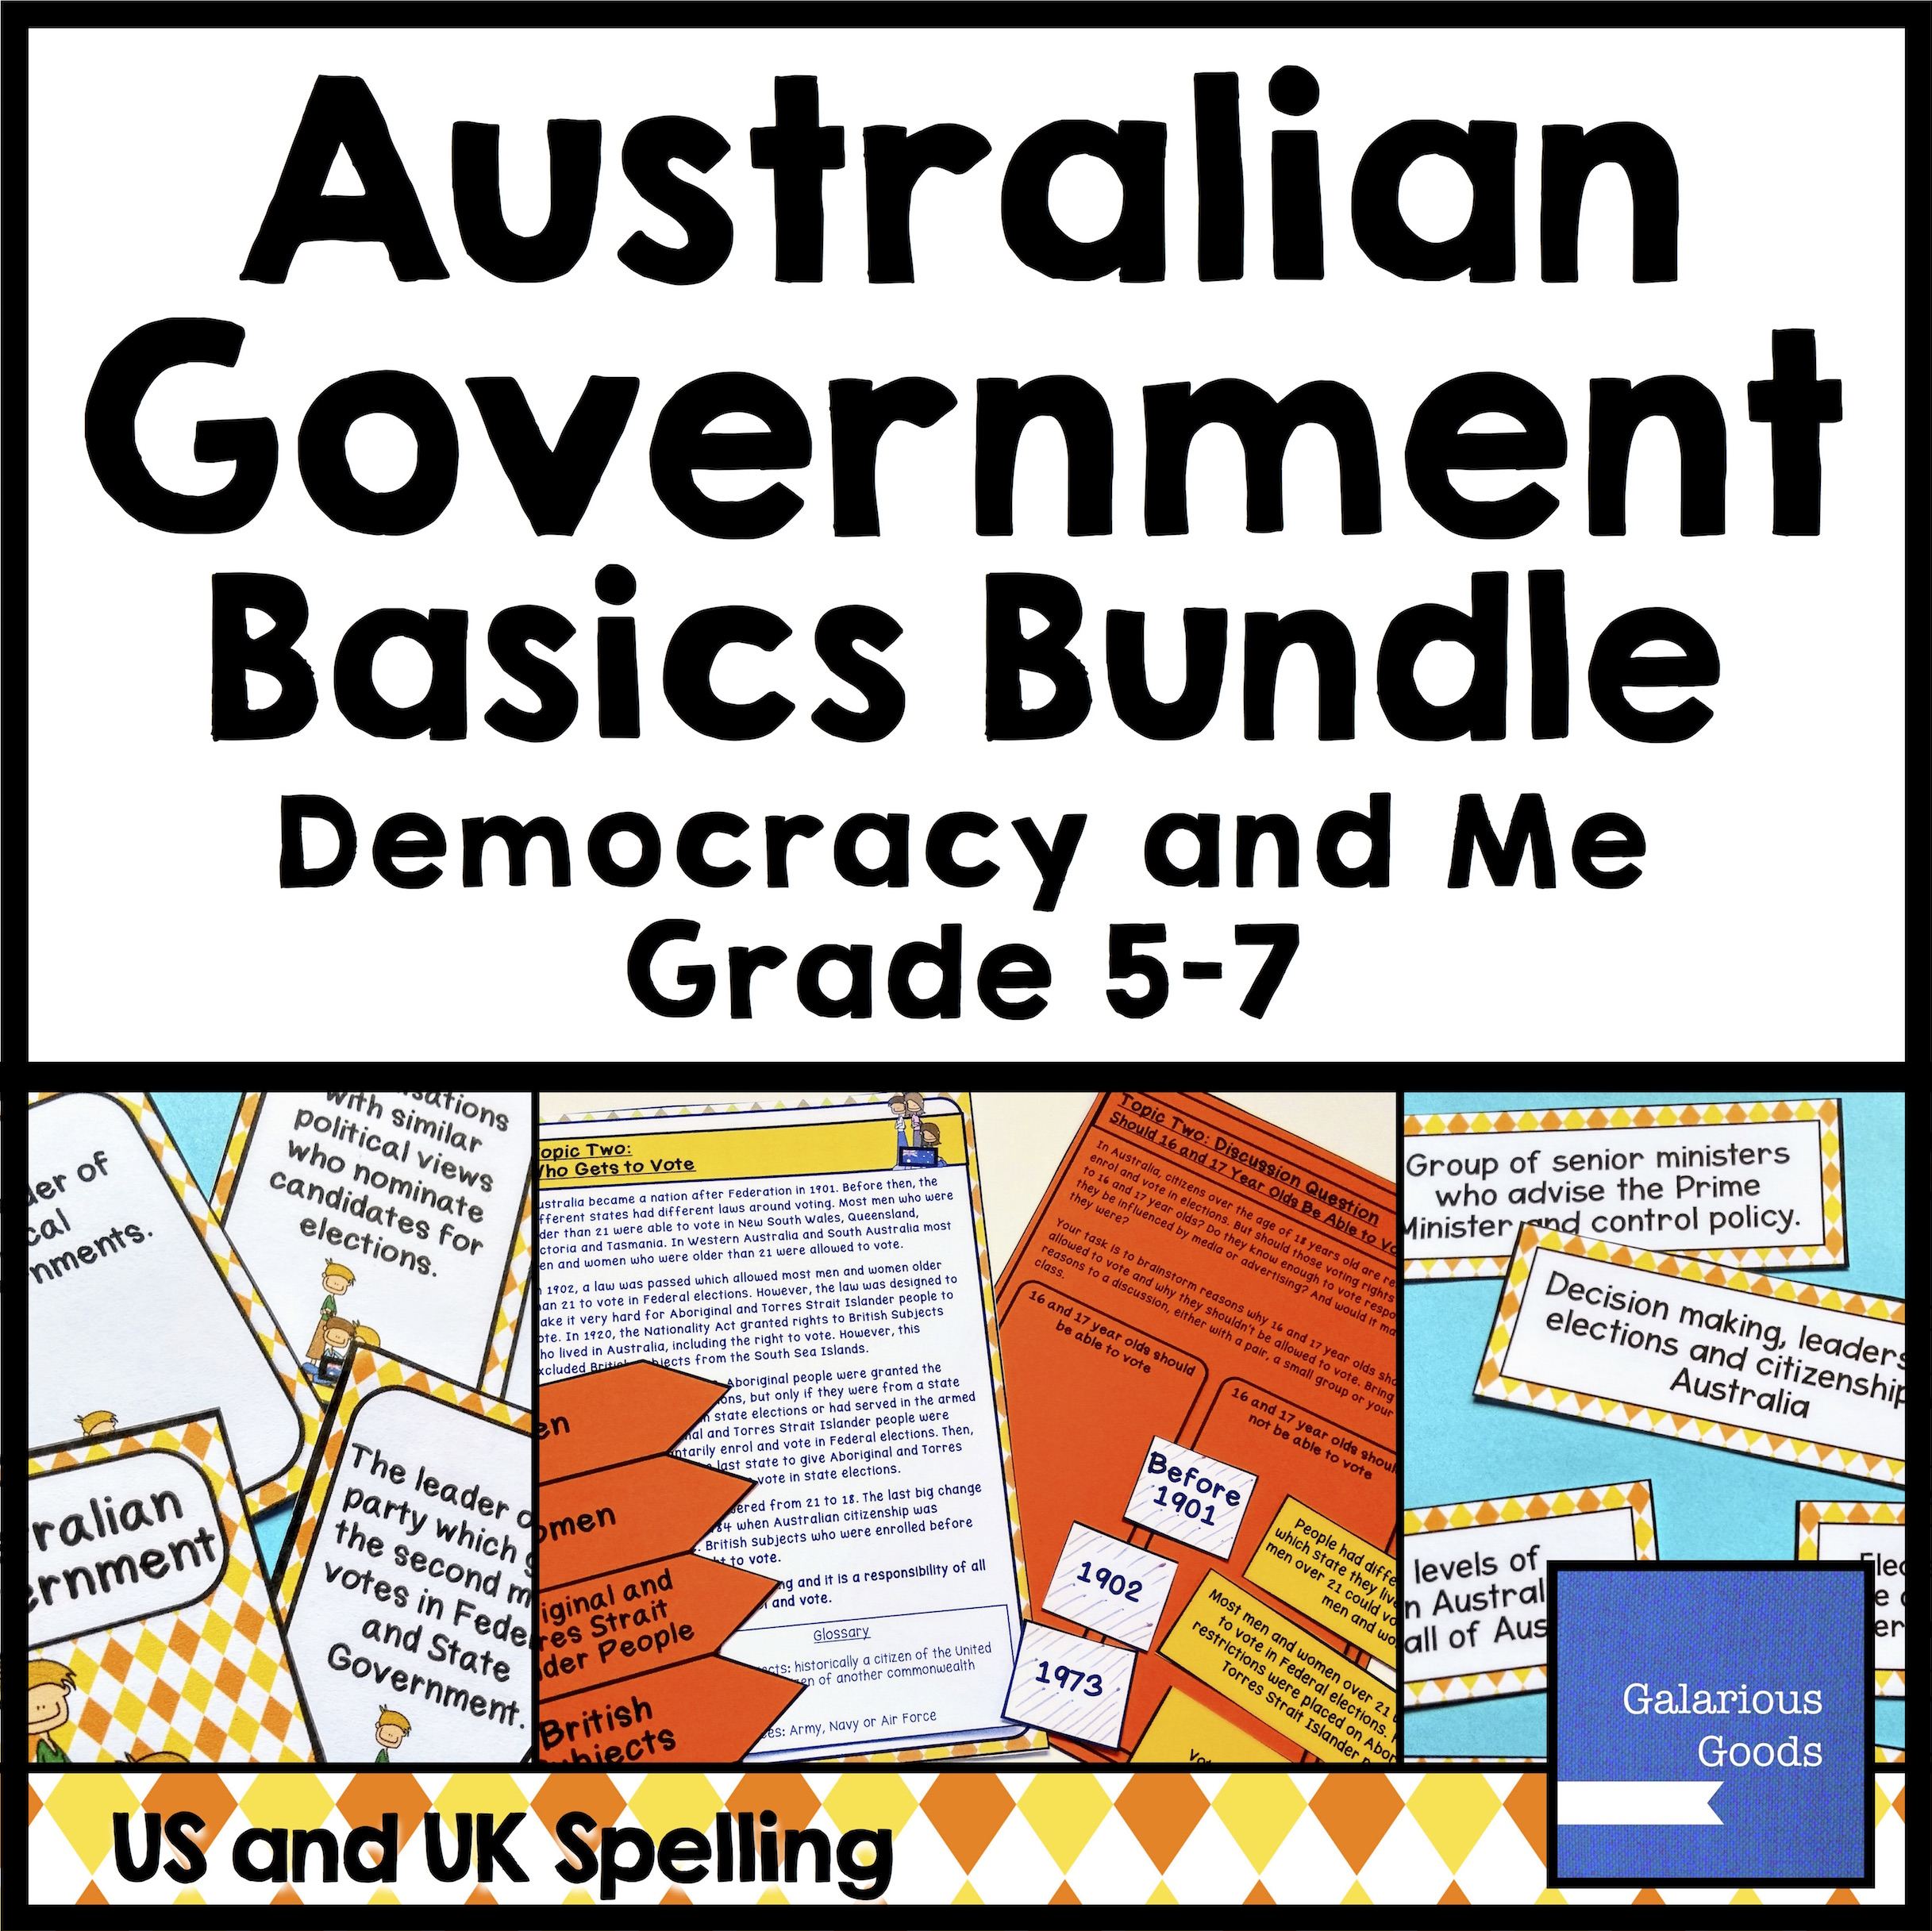 Australian Government Basics